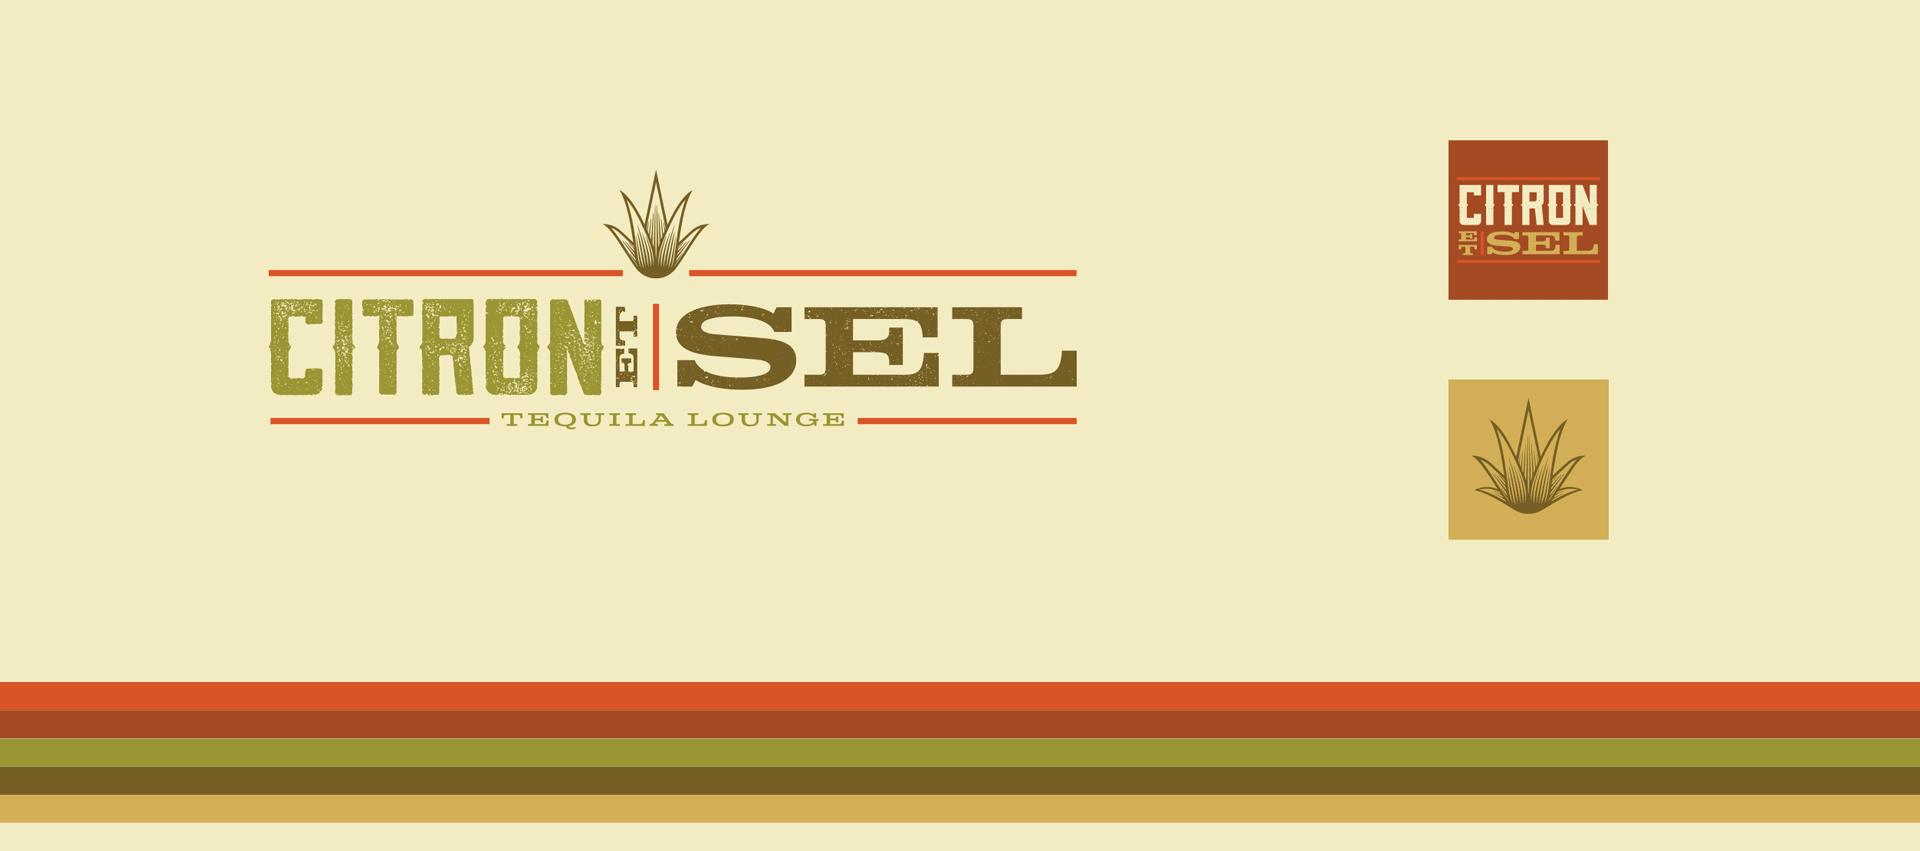 Citron et Sel - Brand Identity, Logo design, Branding, Color Palette